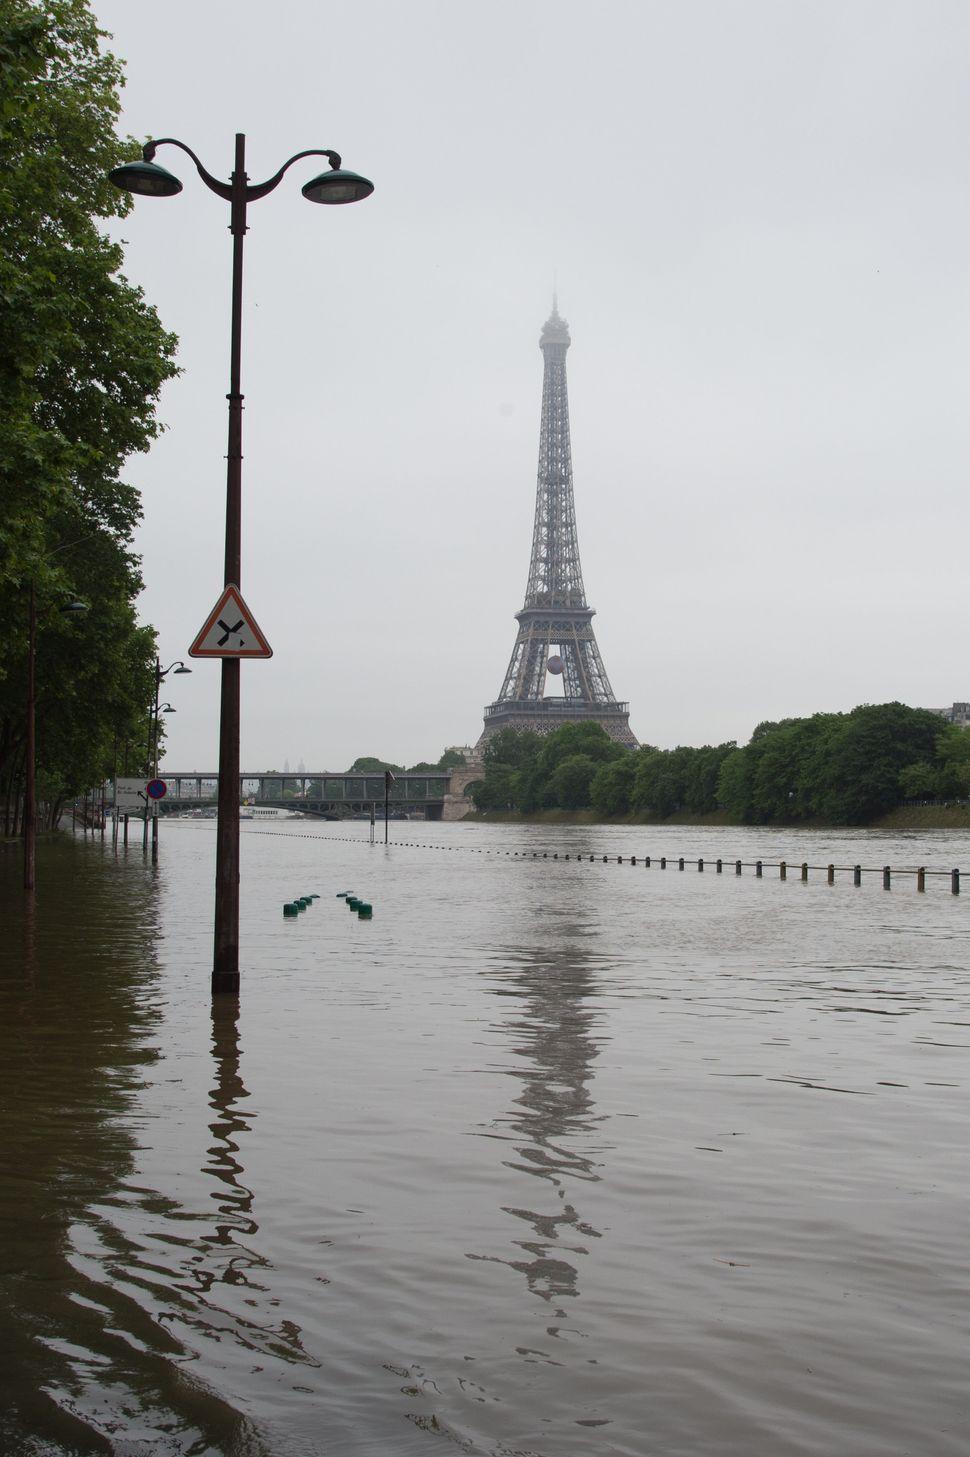 Water rises on roads near the Eiffel Tower.